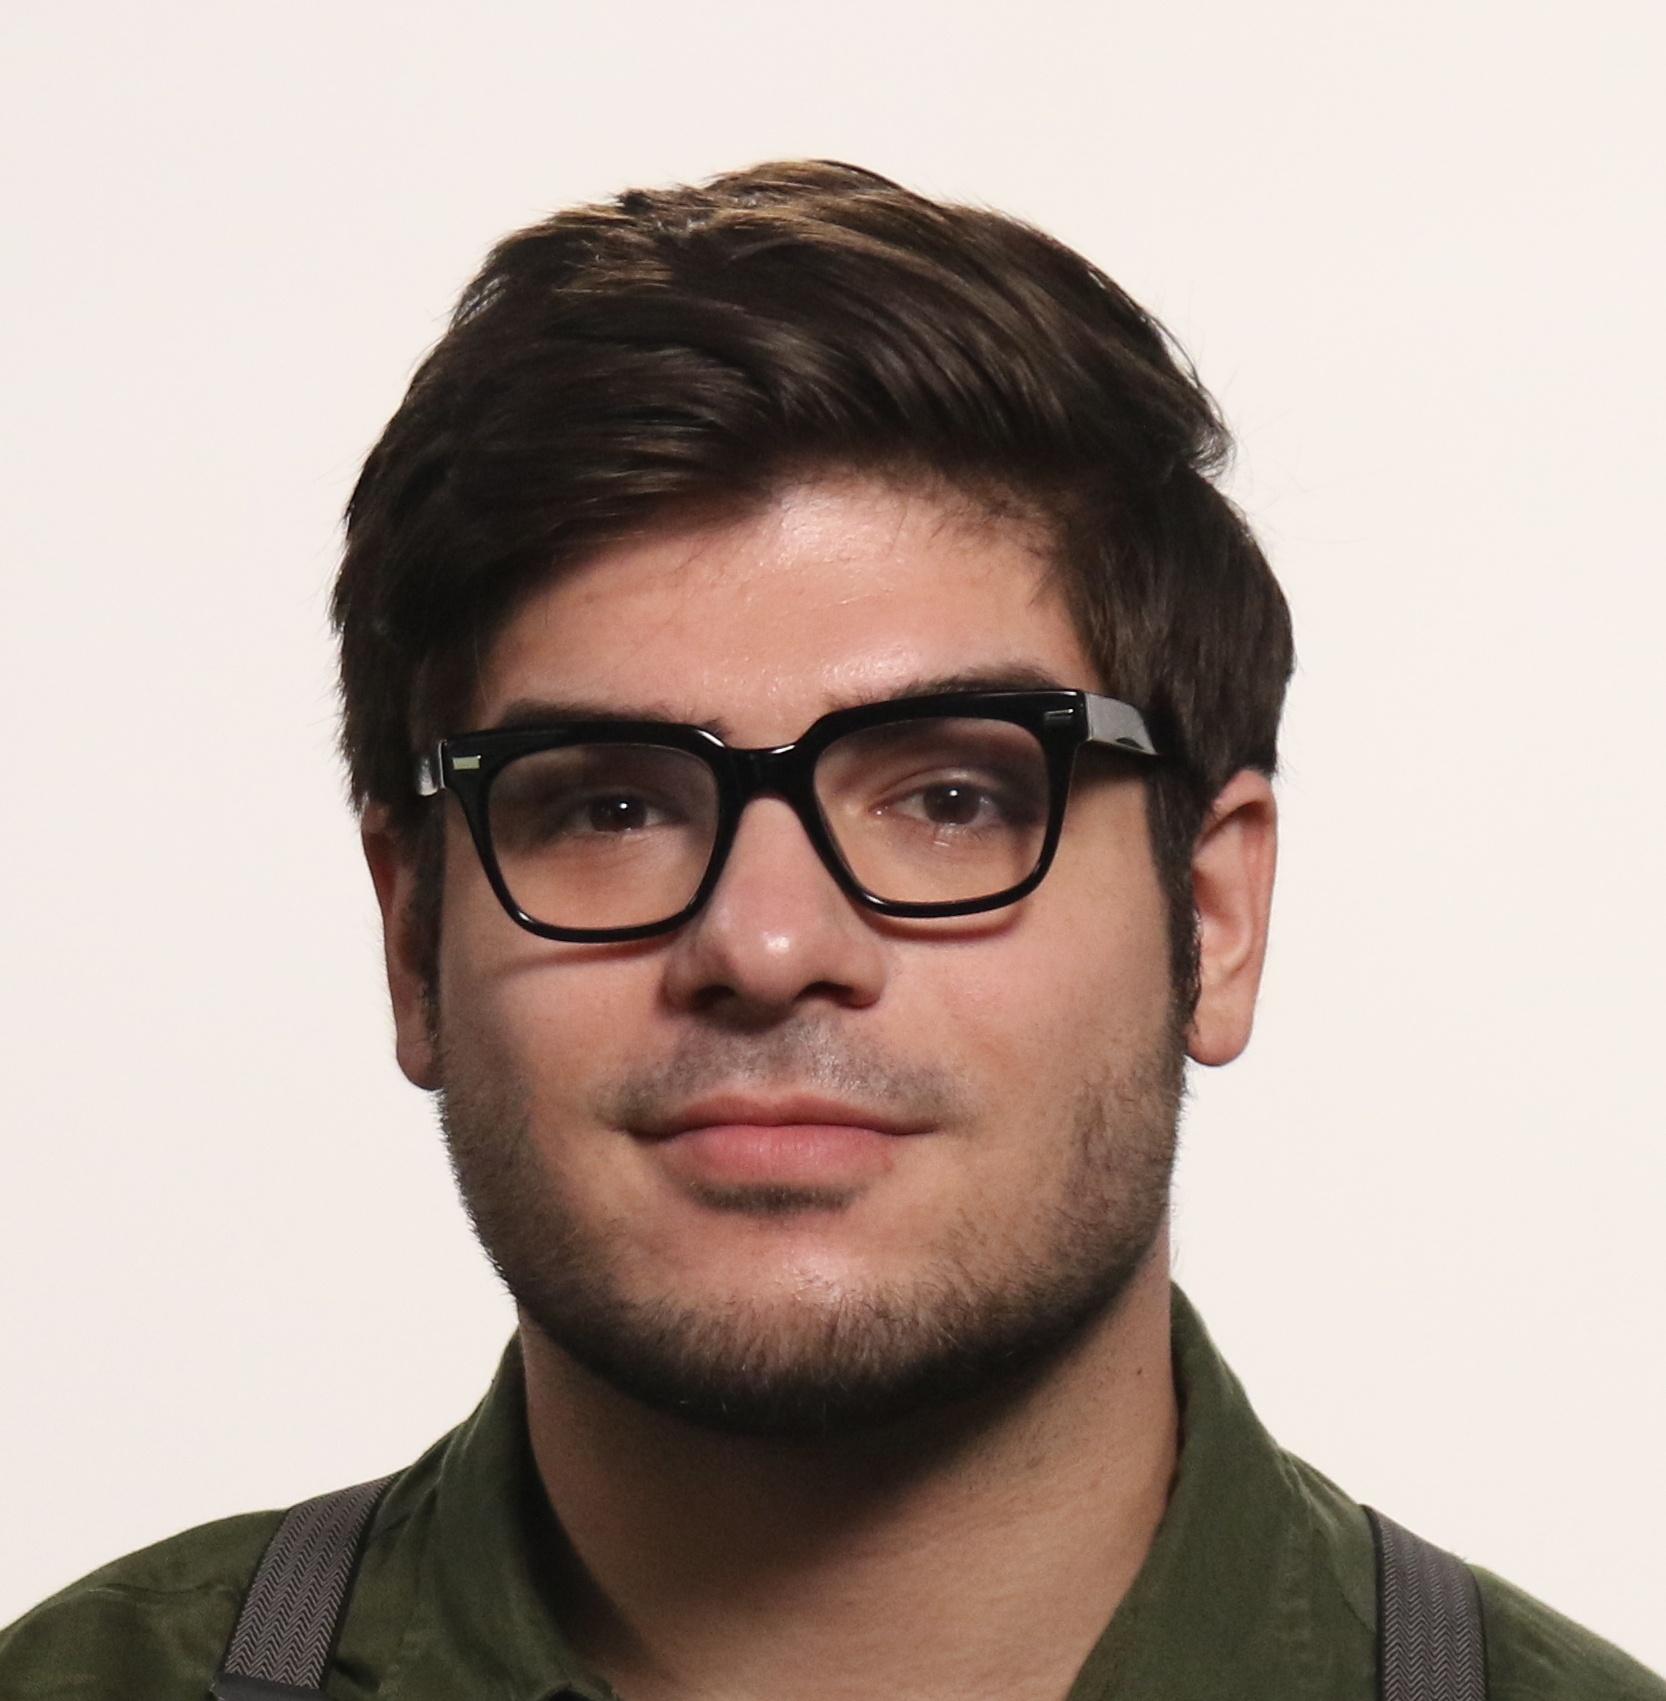 Louis_Spanos_headshot.jpg